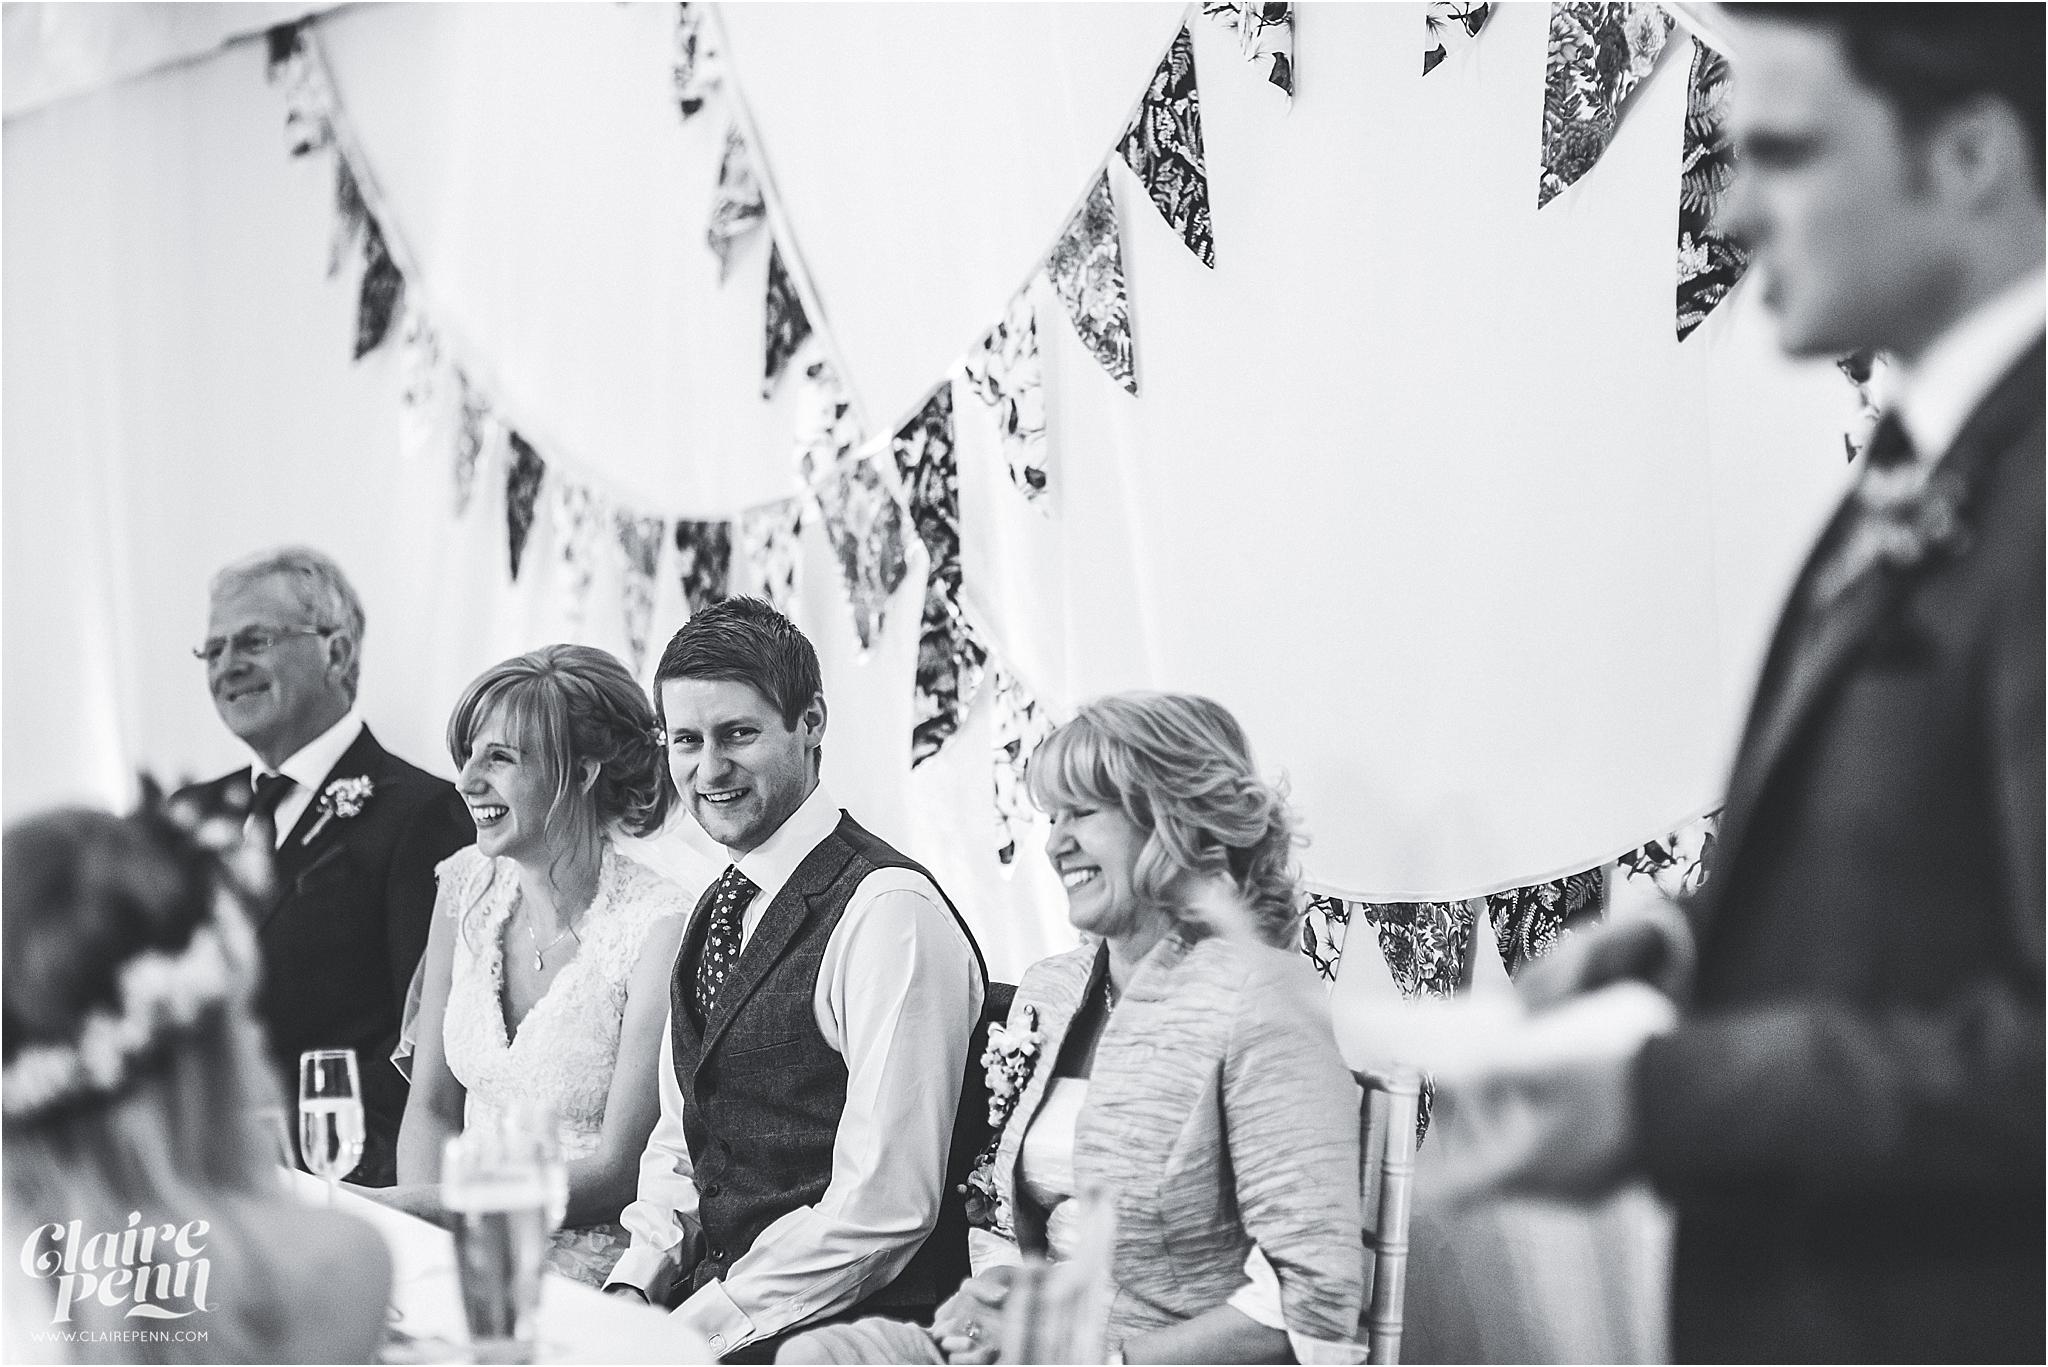 Iscoyd Park wedding, Whitchurch, Cheshire wedding photographer_0063.jpg